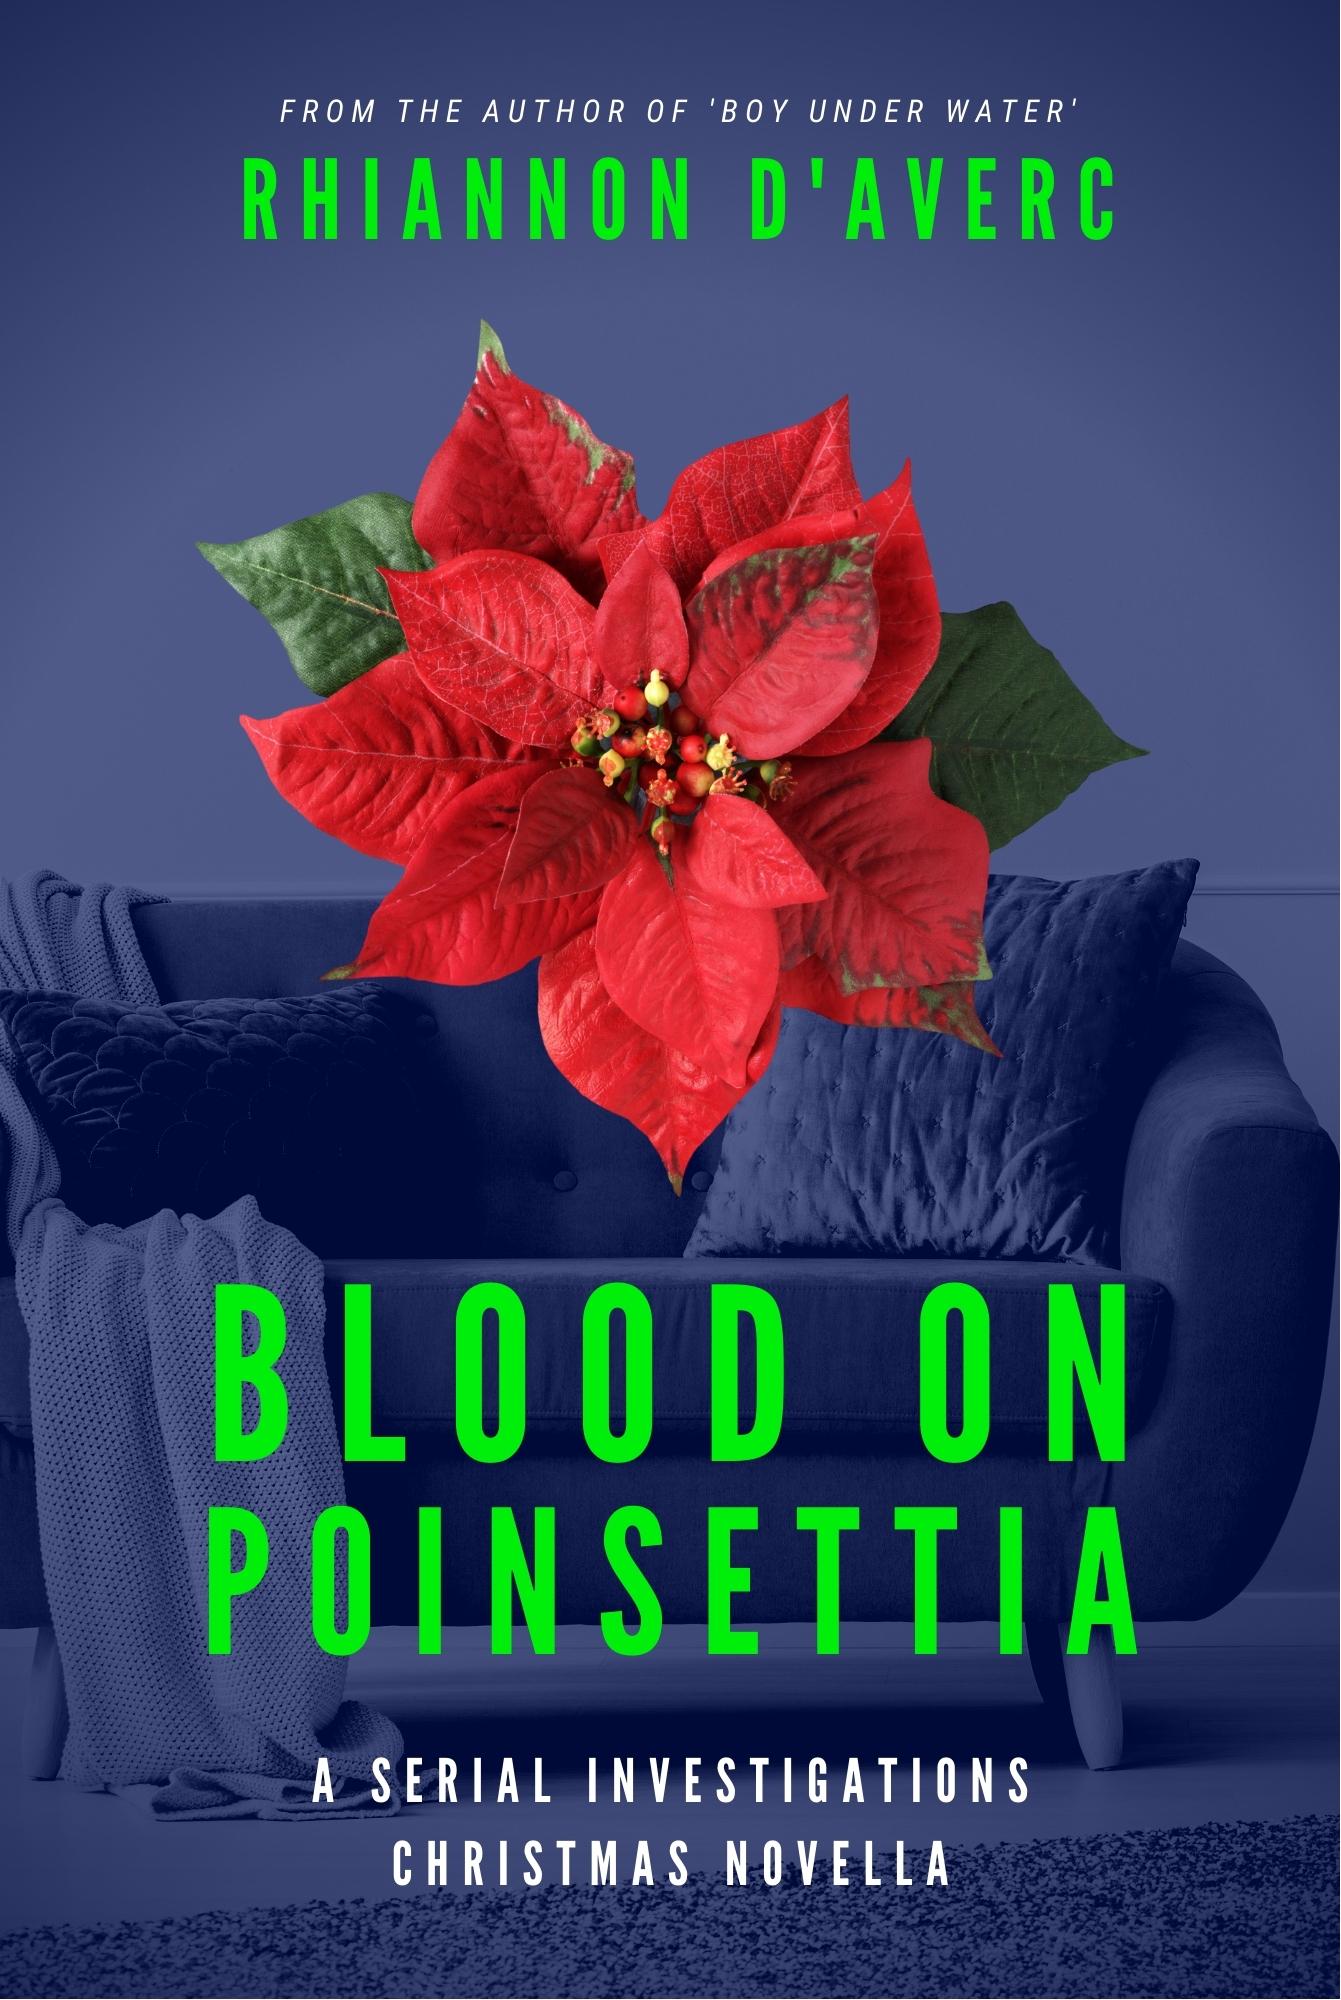 blood on poinsettia sic1